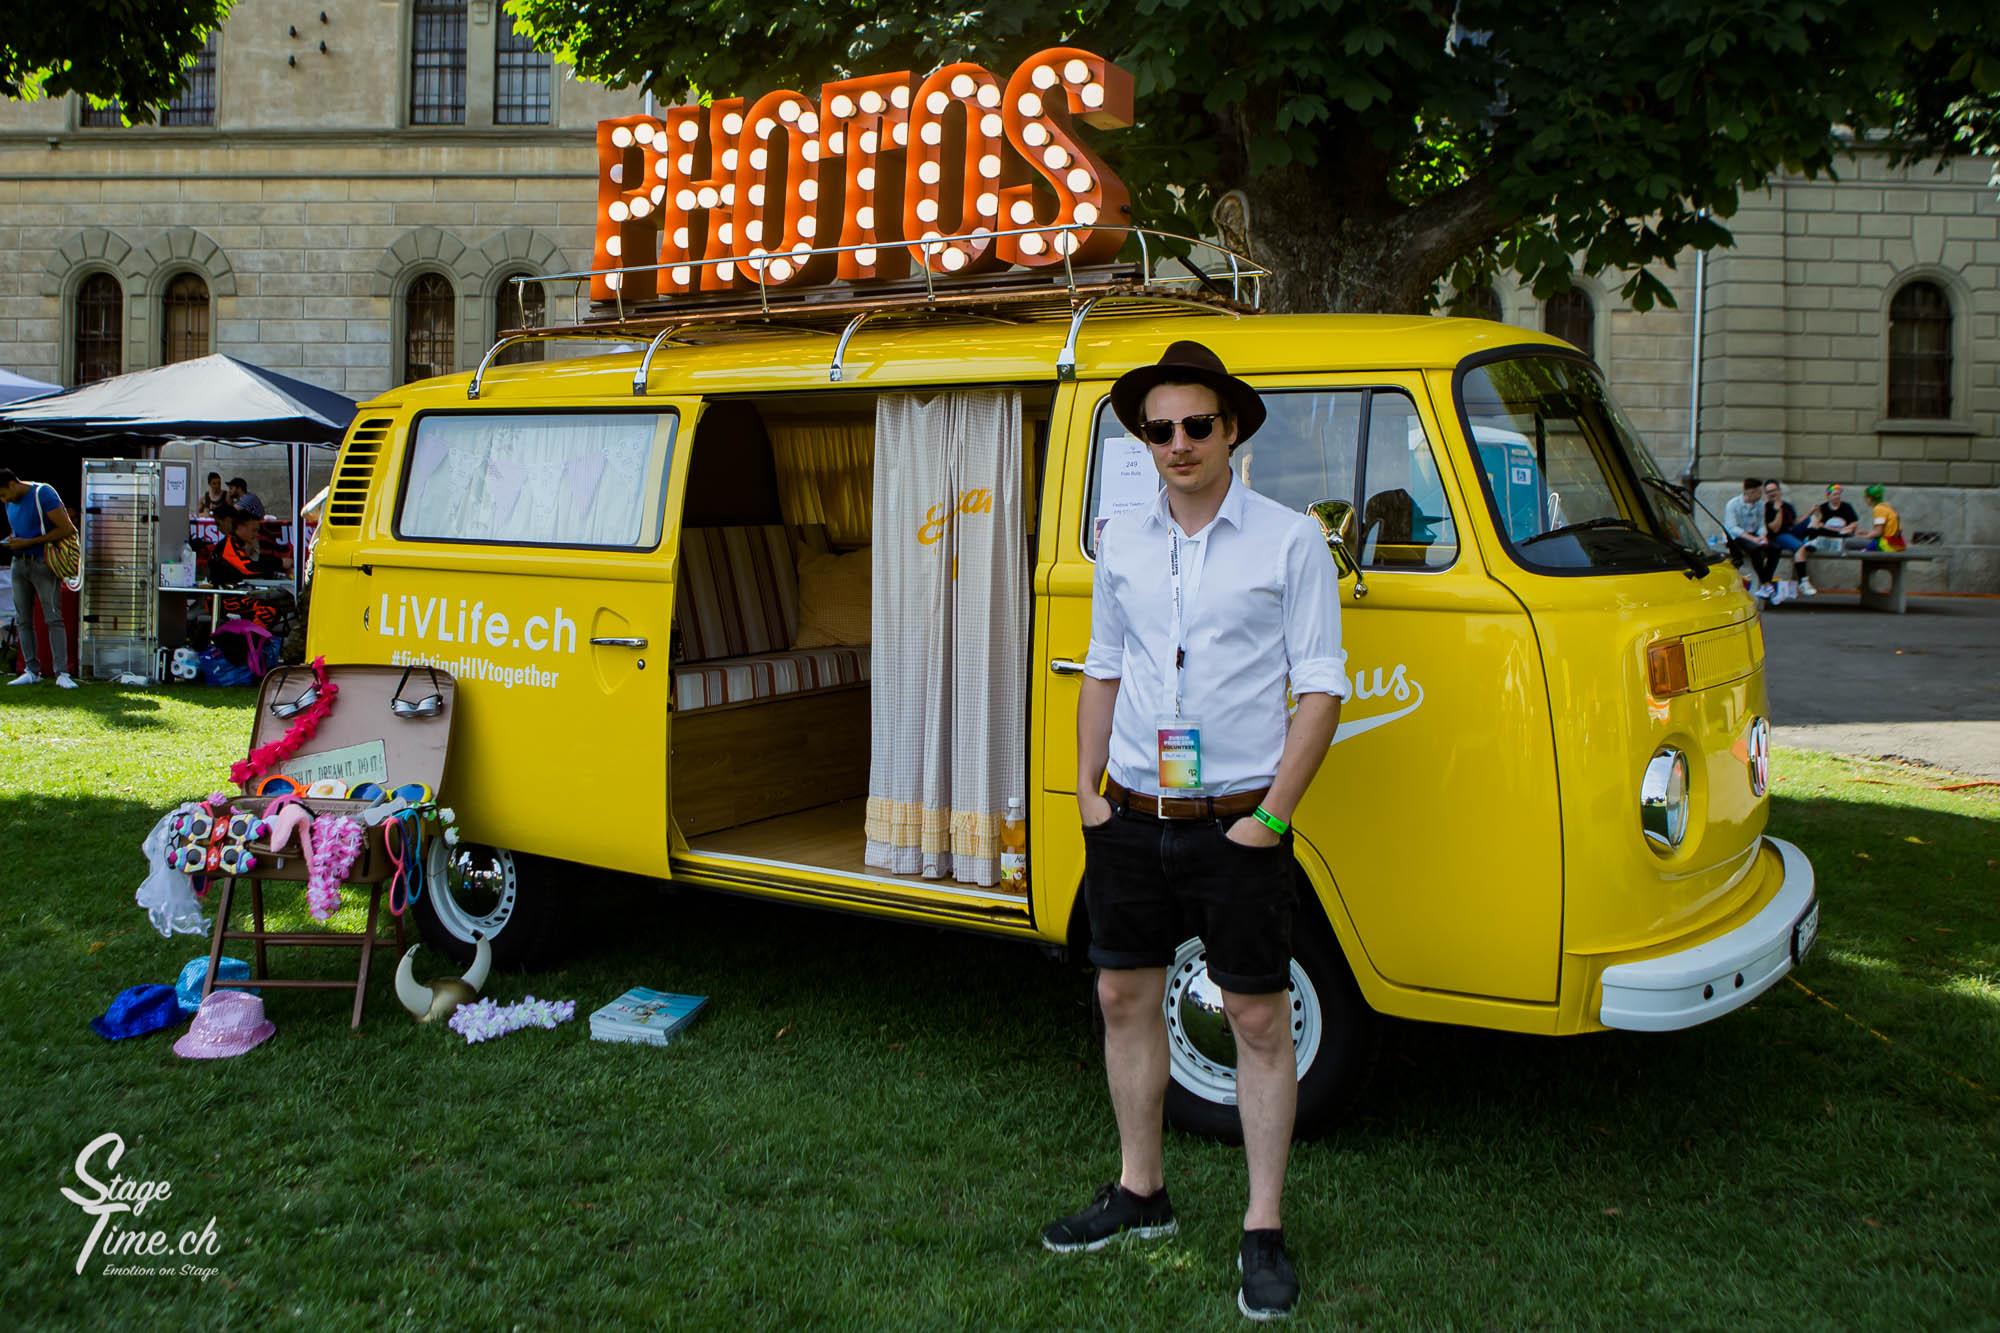 Zurich_Pride_Festival_2018___📷_Christoph_Gurtner___stagetime.ch-2